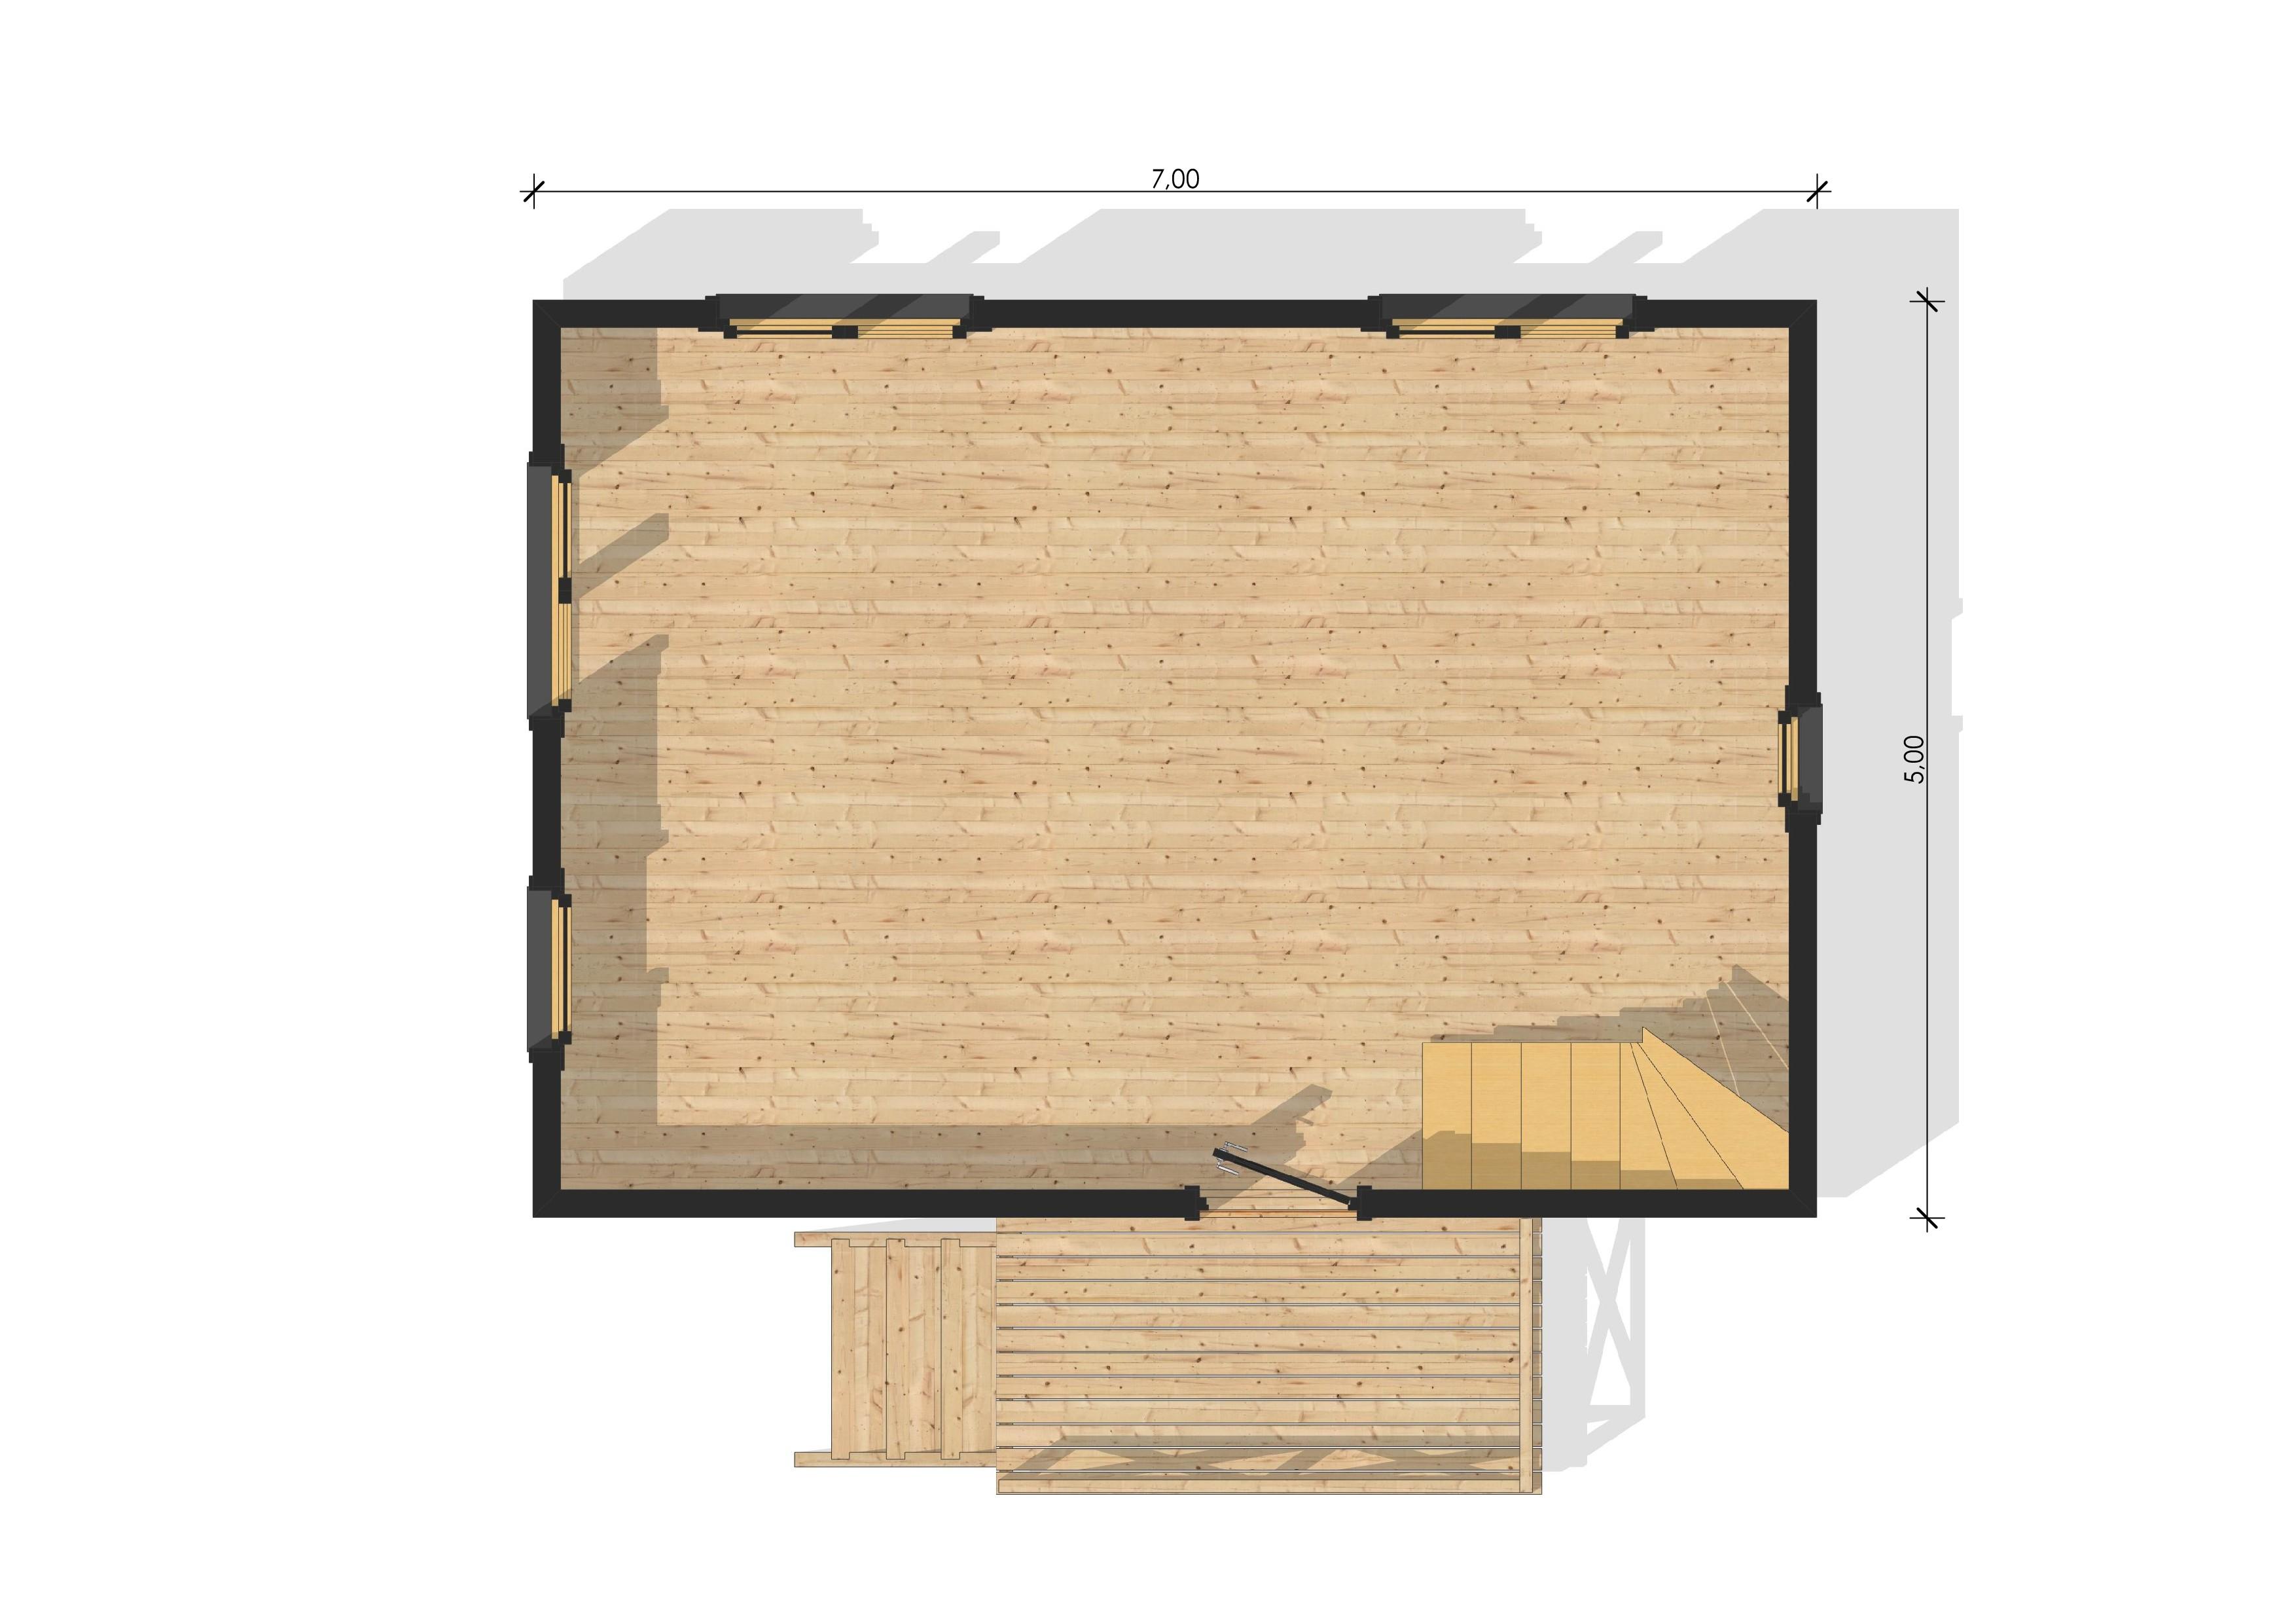 Maison de jardin bretagne en bois en kit - Plan de maison bretagne ...